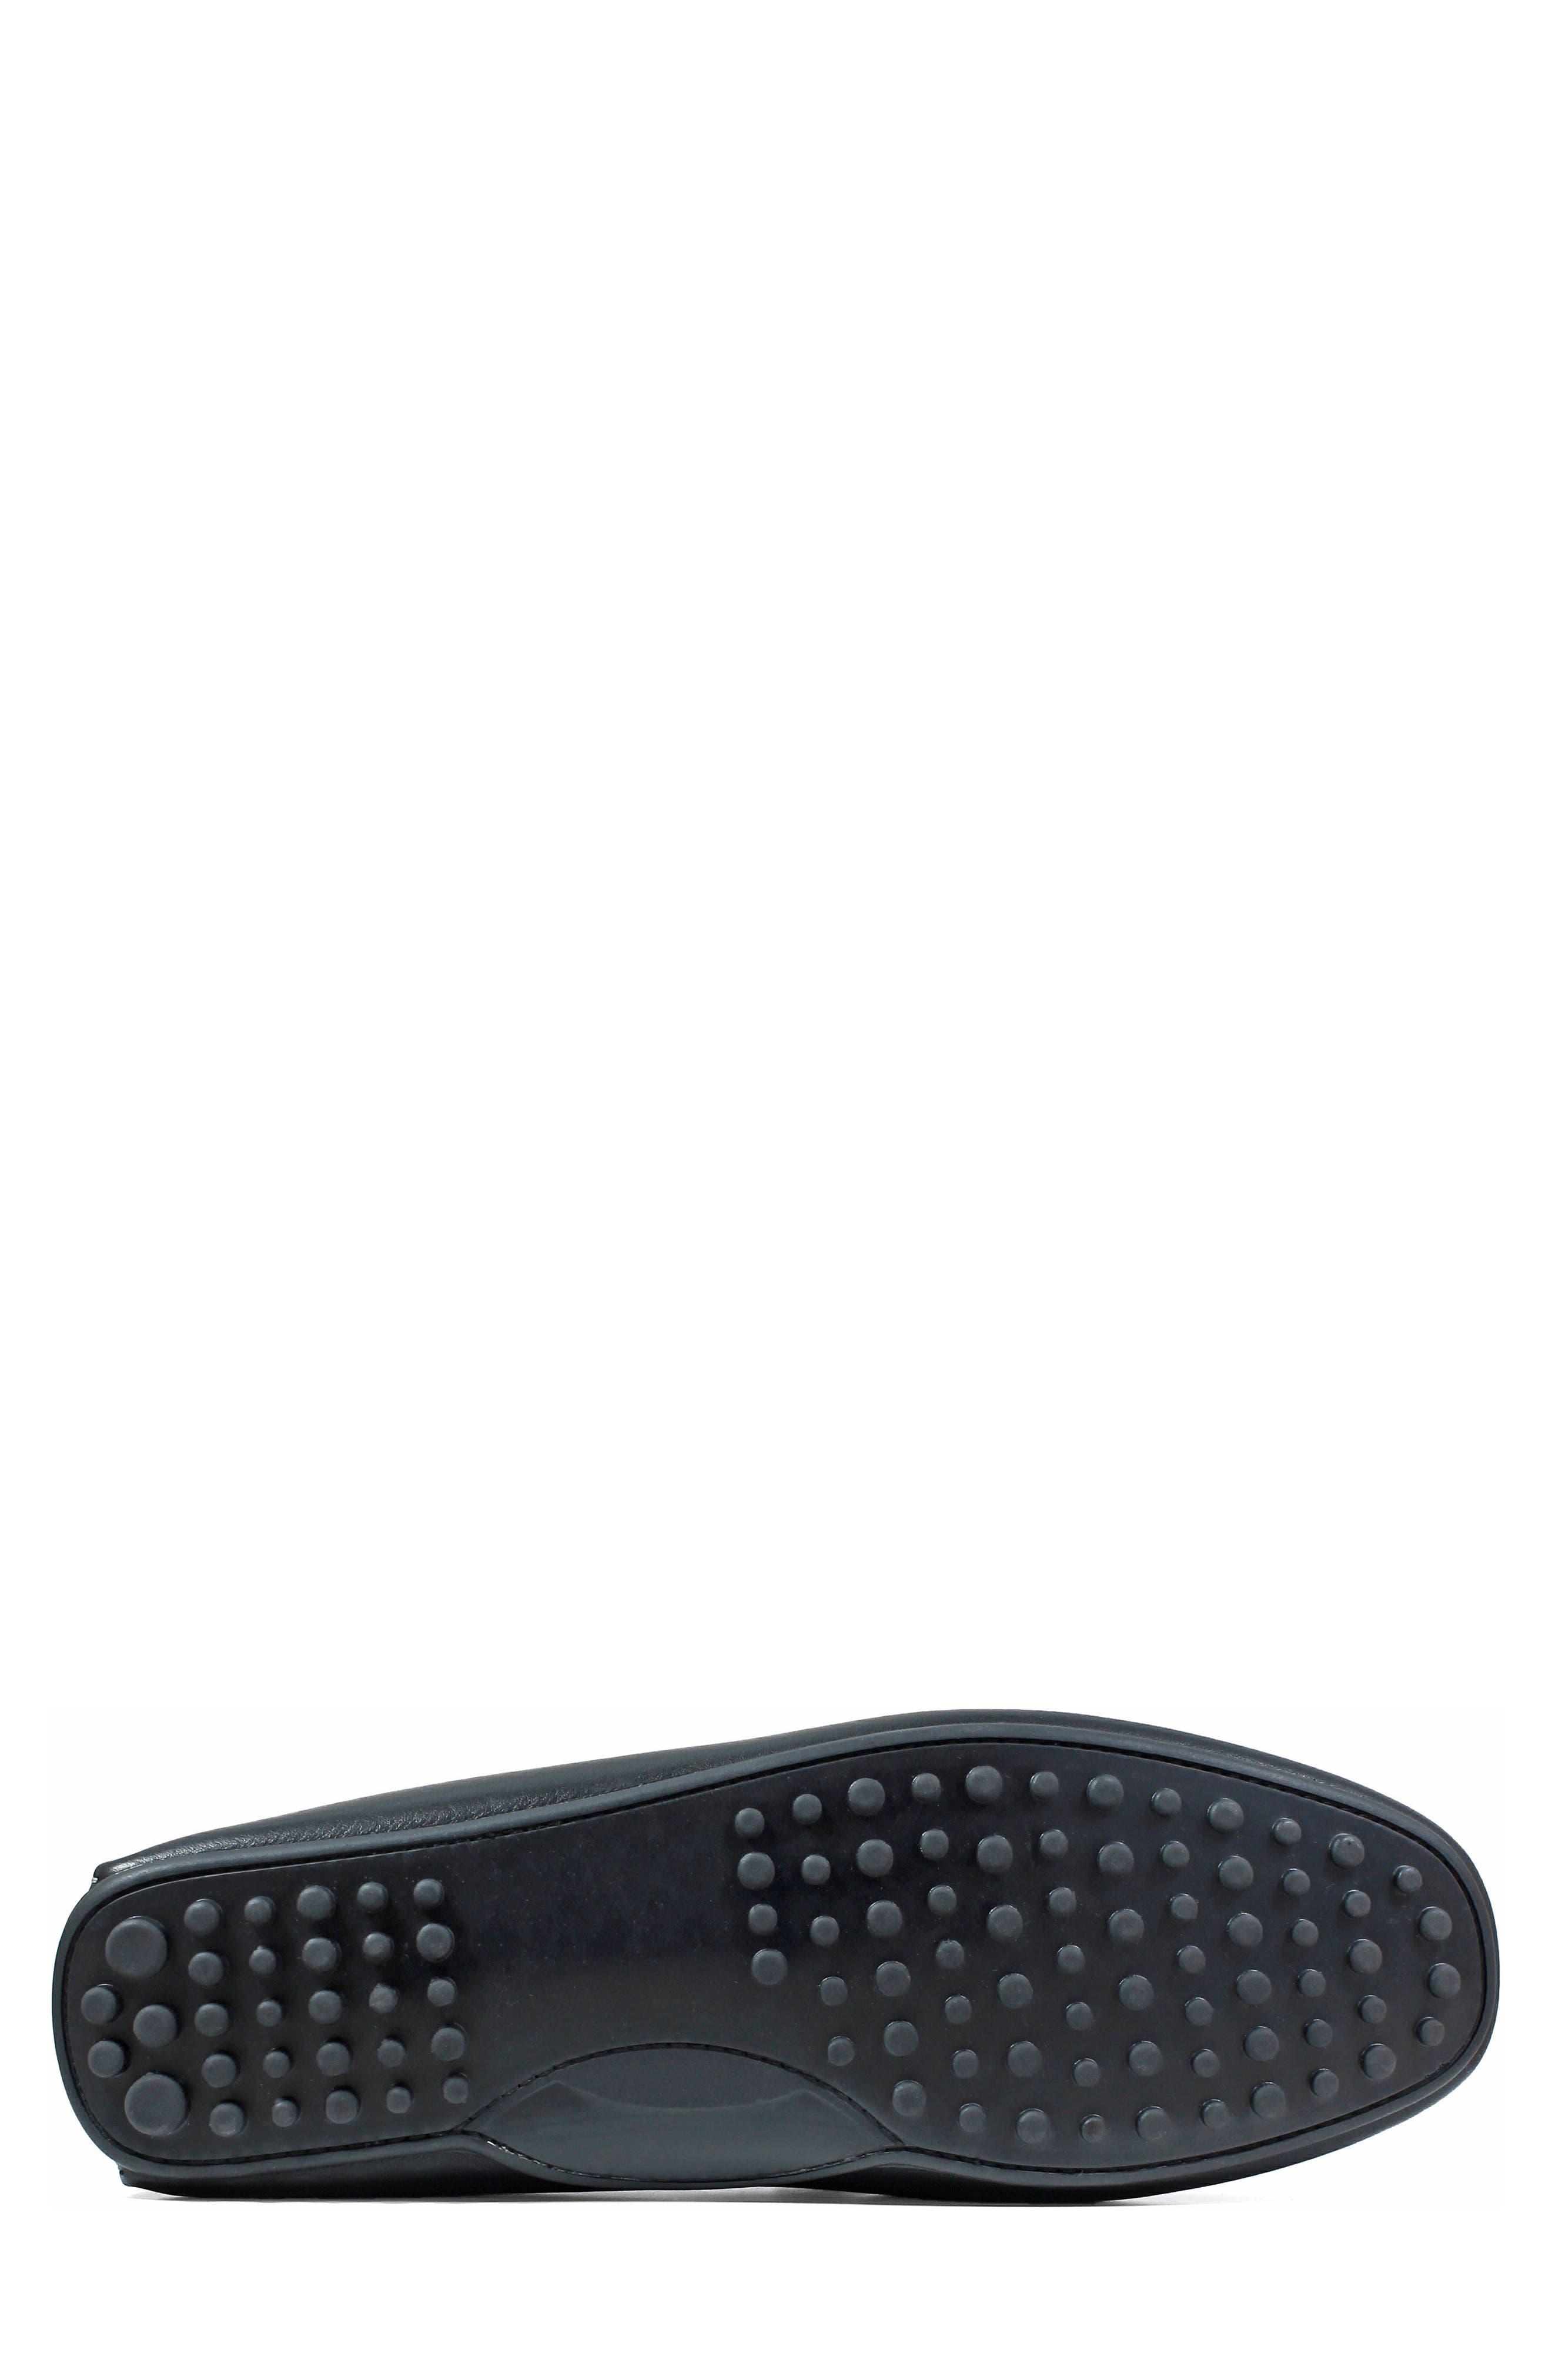 FLORSHEIM,                             Imperial Comet Driving Shoe,                             Alternate thumbnail 6, color,                             BLACK LEATHER